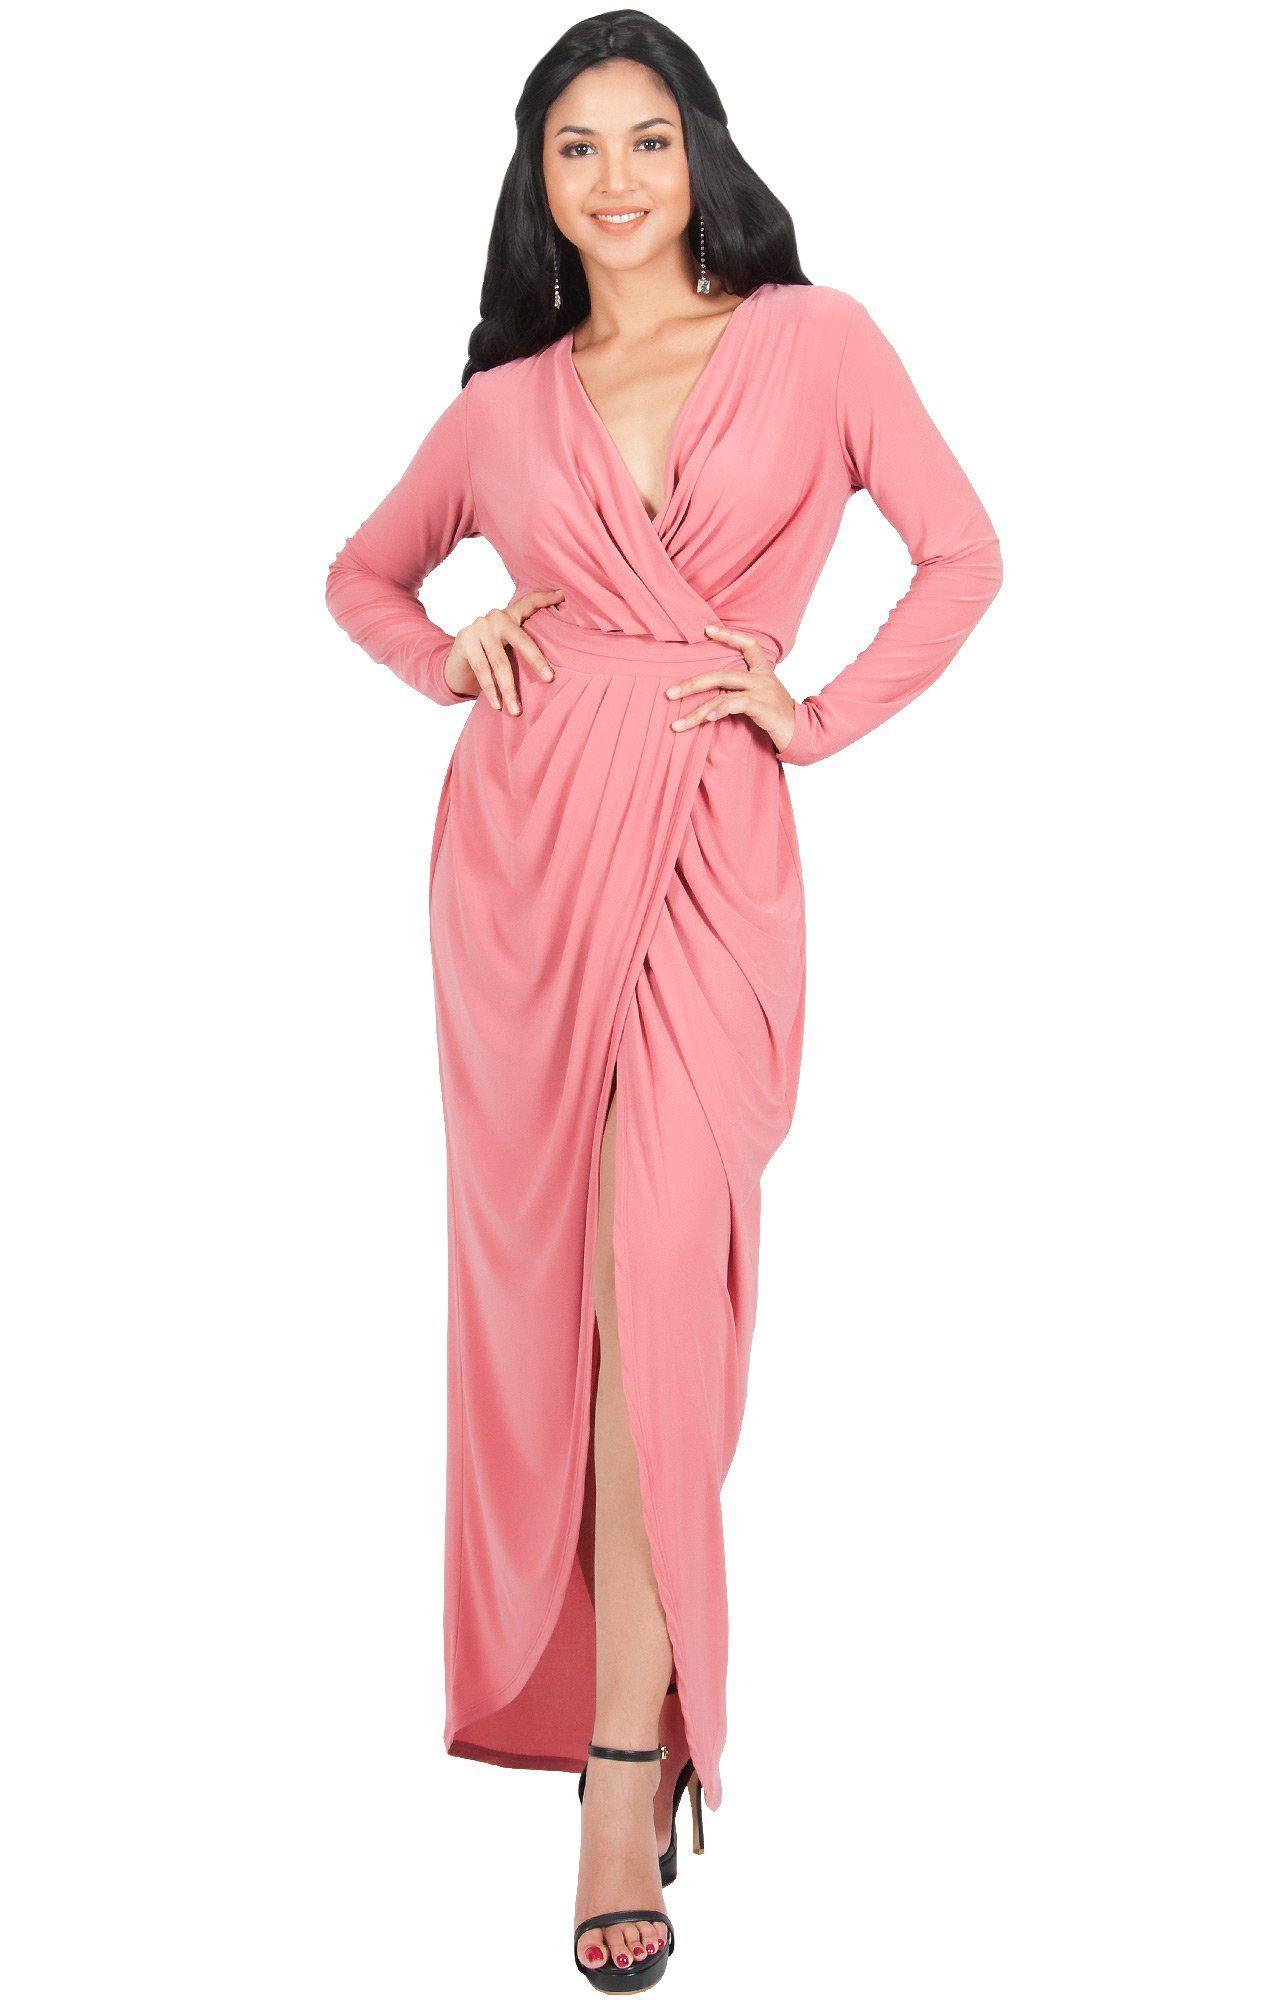 Maternity Outfits - modest maternity dresses : KOH KOH ...